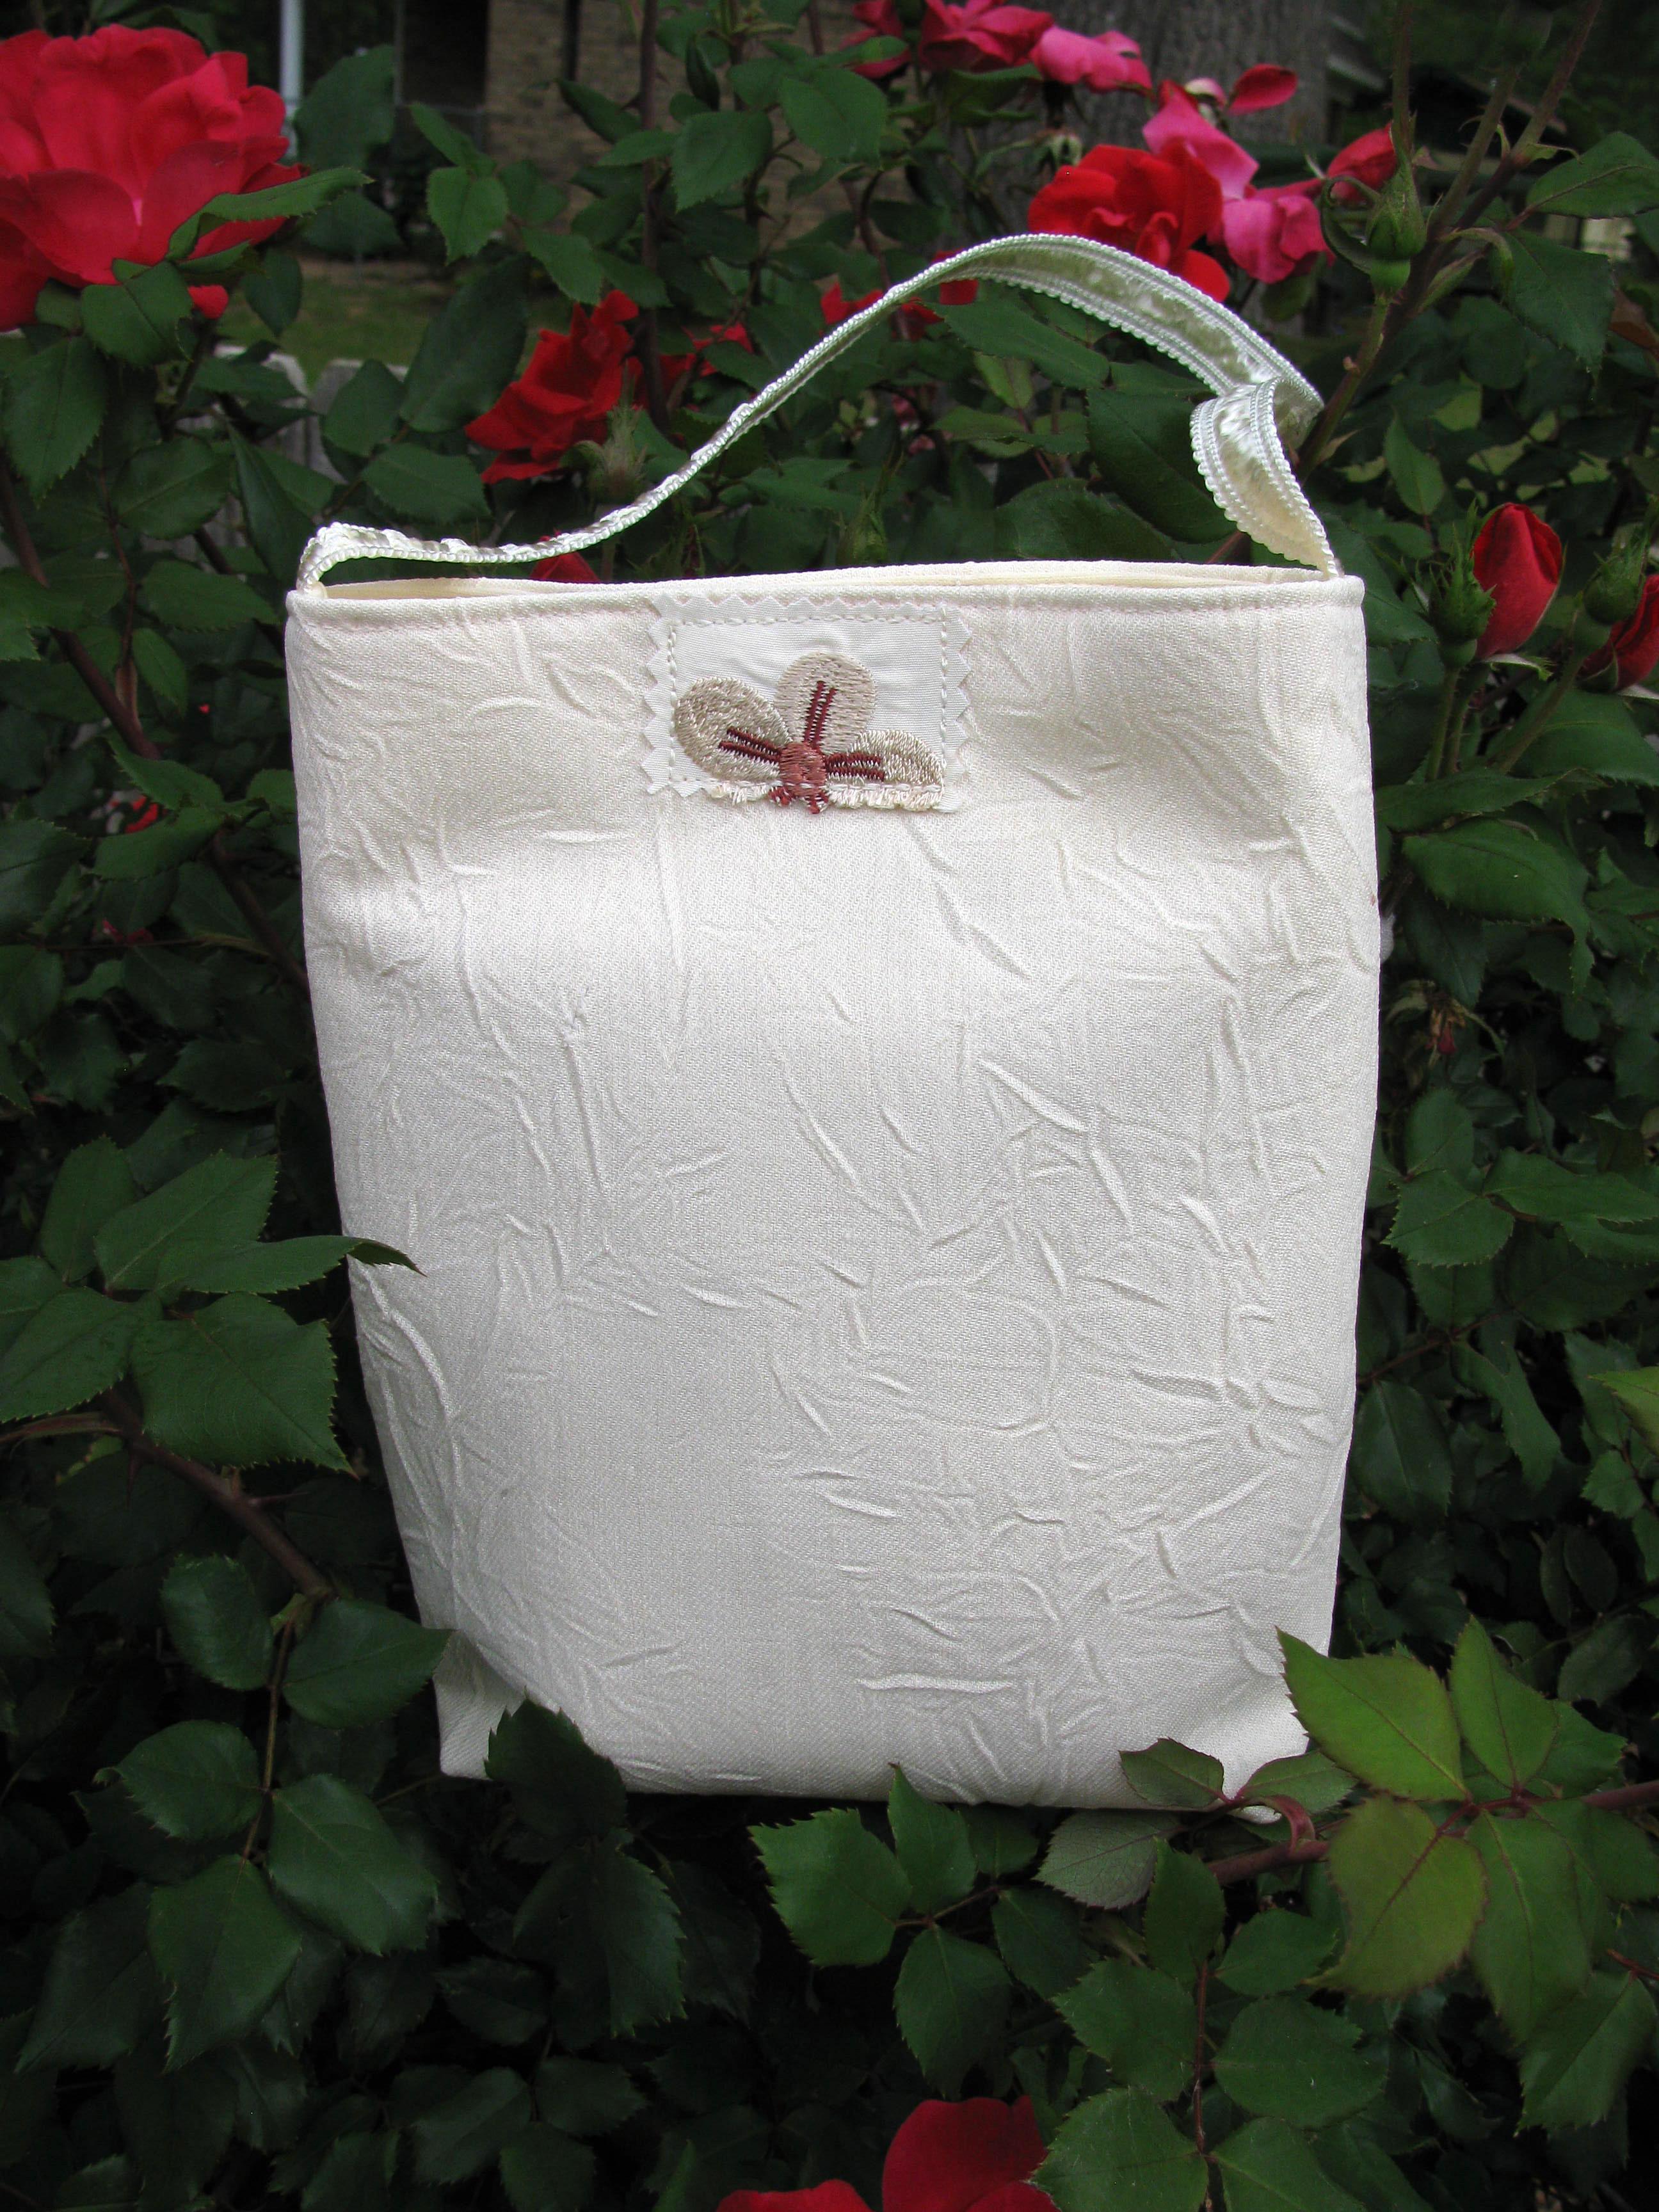 Special Occasion Purse, Wedding bag, Party Bag – I Shop JW